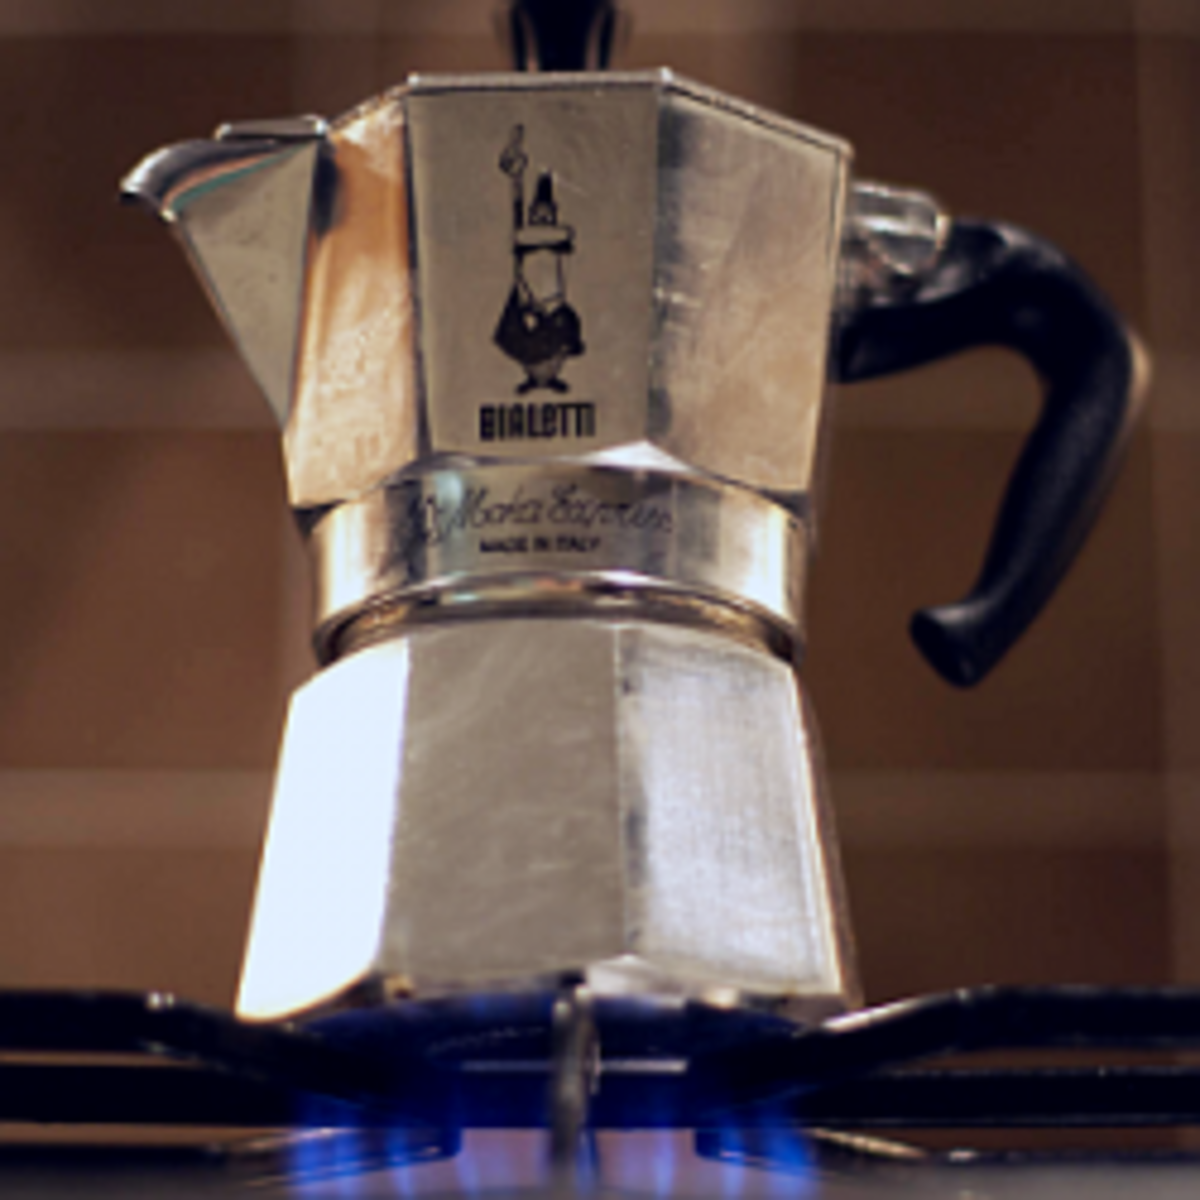 moka-pot-vs-aeropress-vs-french-press-espresso-alternative-brews